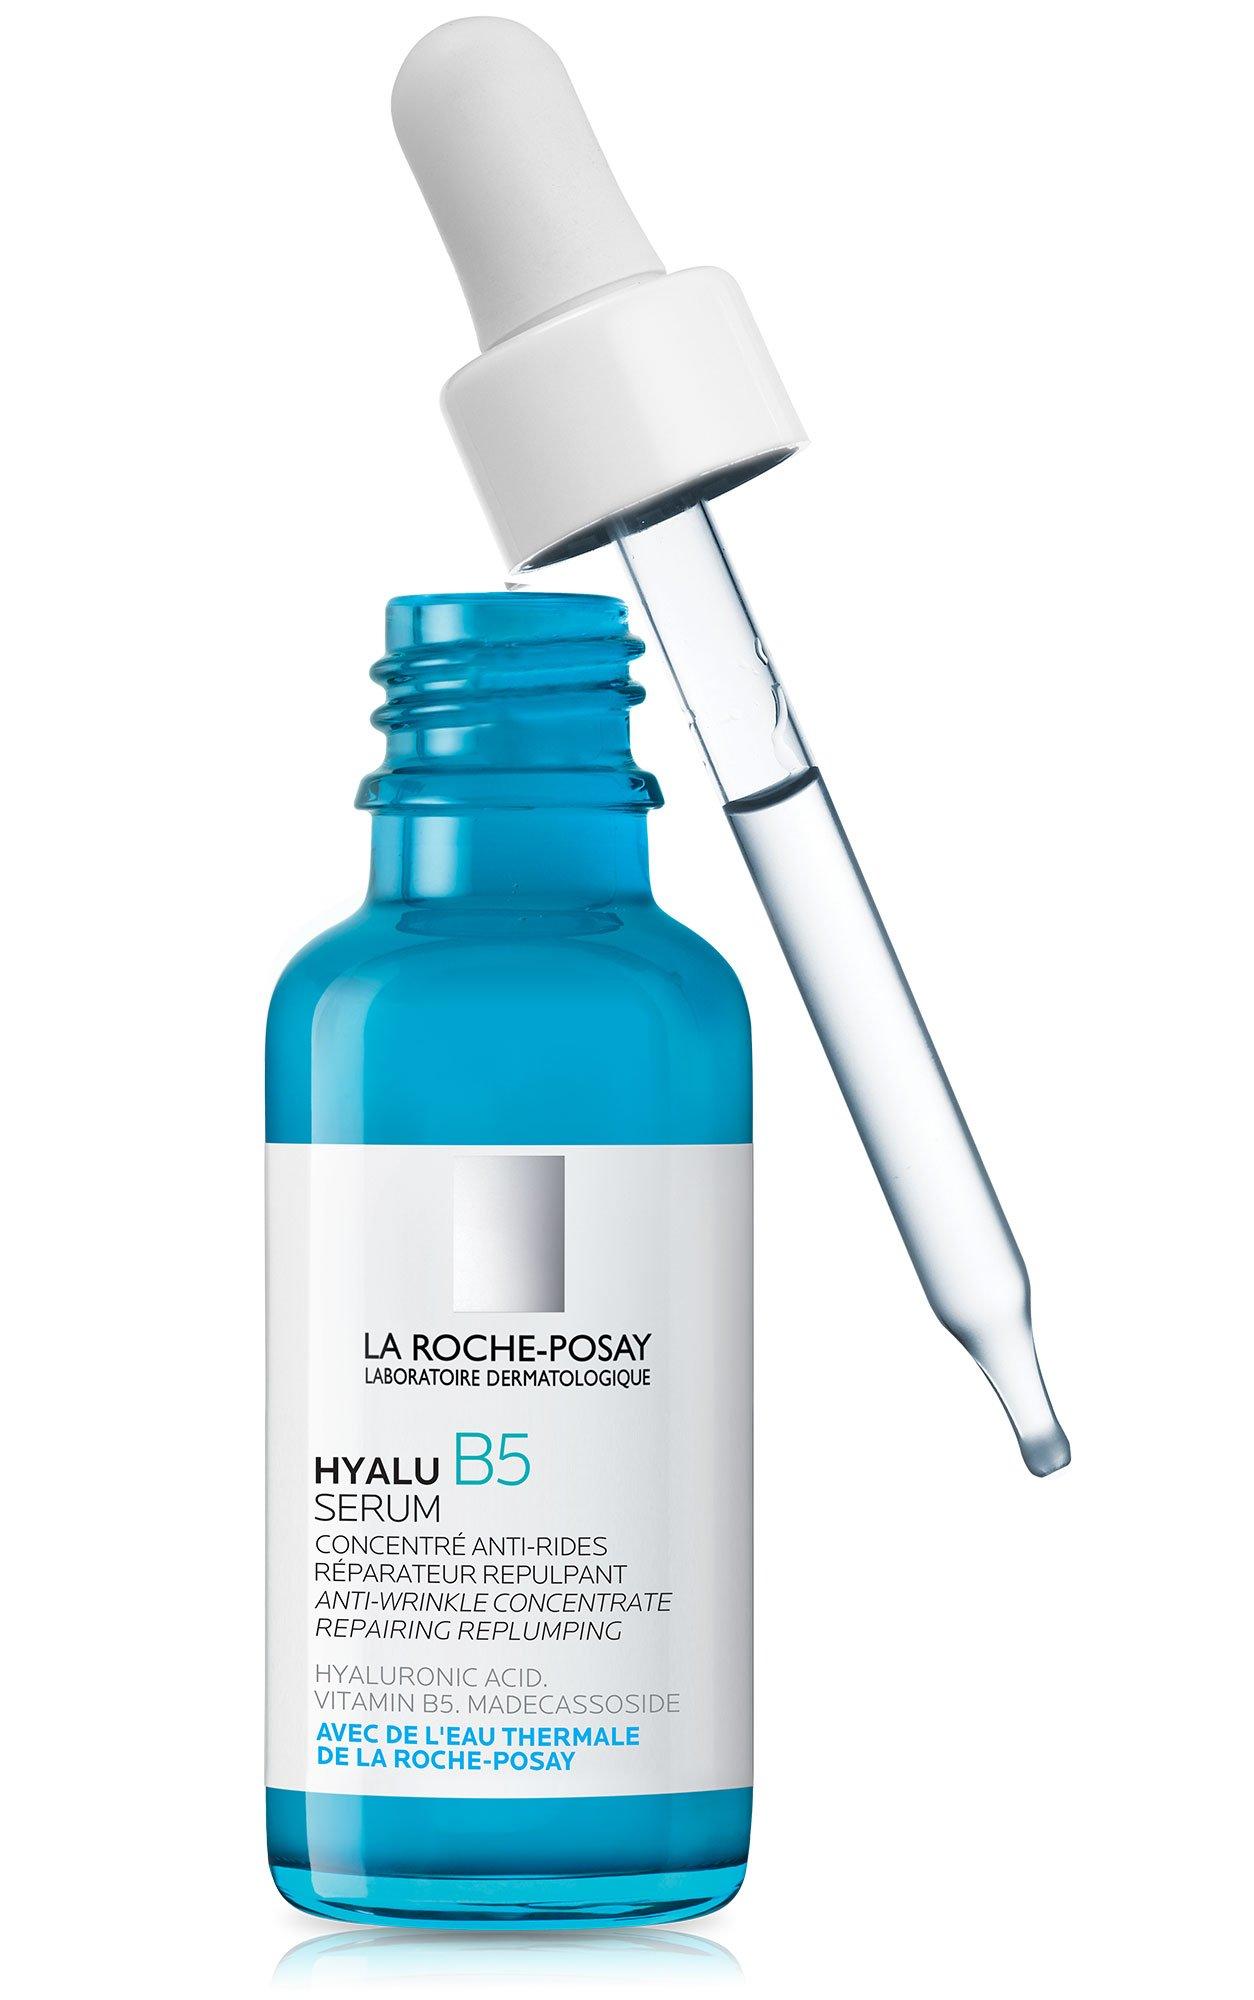 La Roche-Posay Hyalu B5 Hyaluronic Acid Serum Anti-Wrinkle Concentrate, 1.01 Fl. Oz.